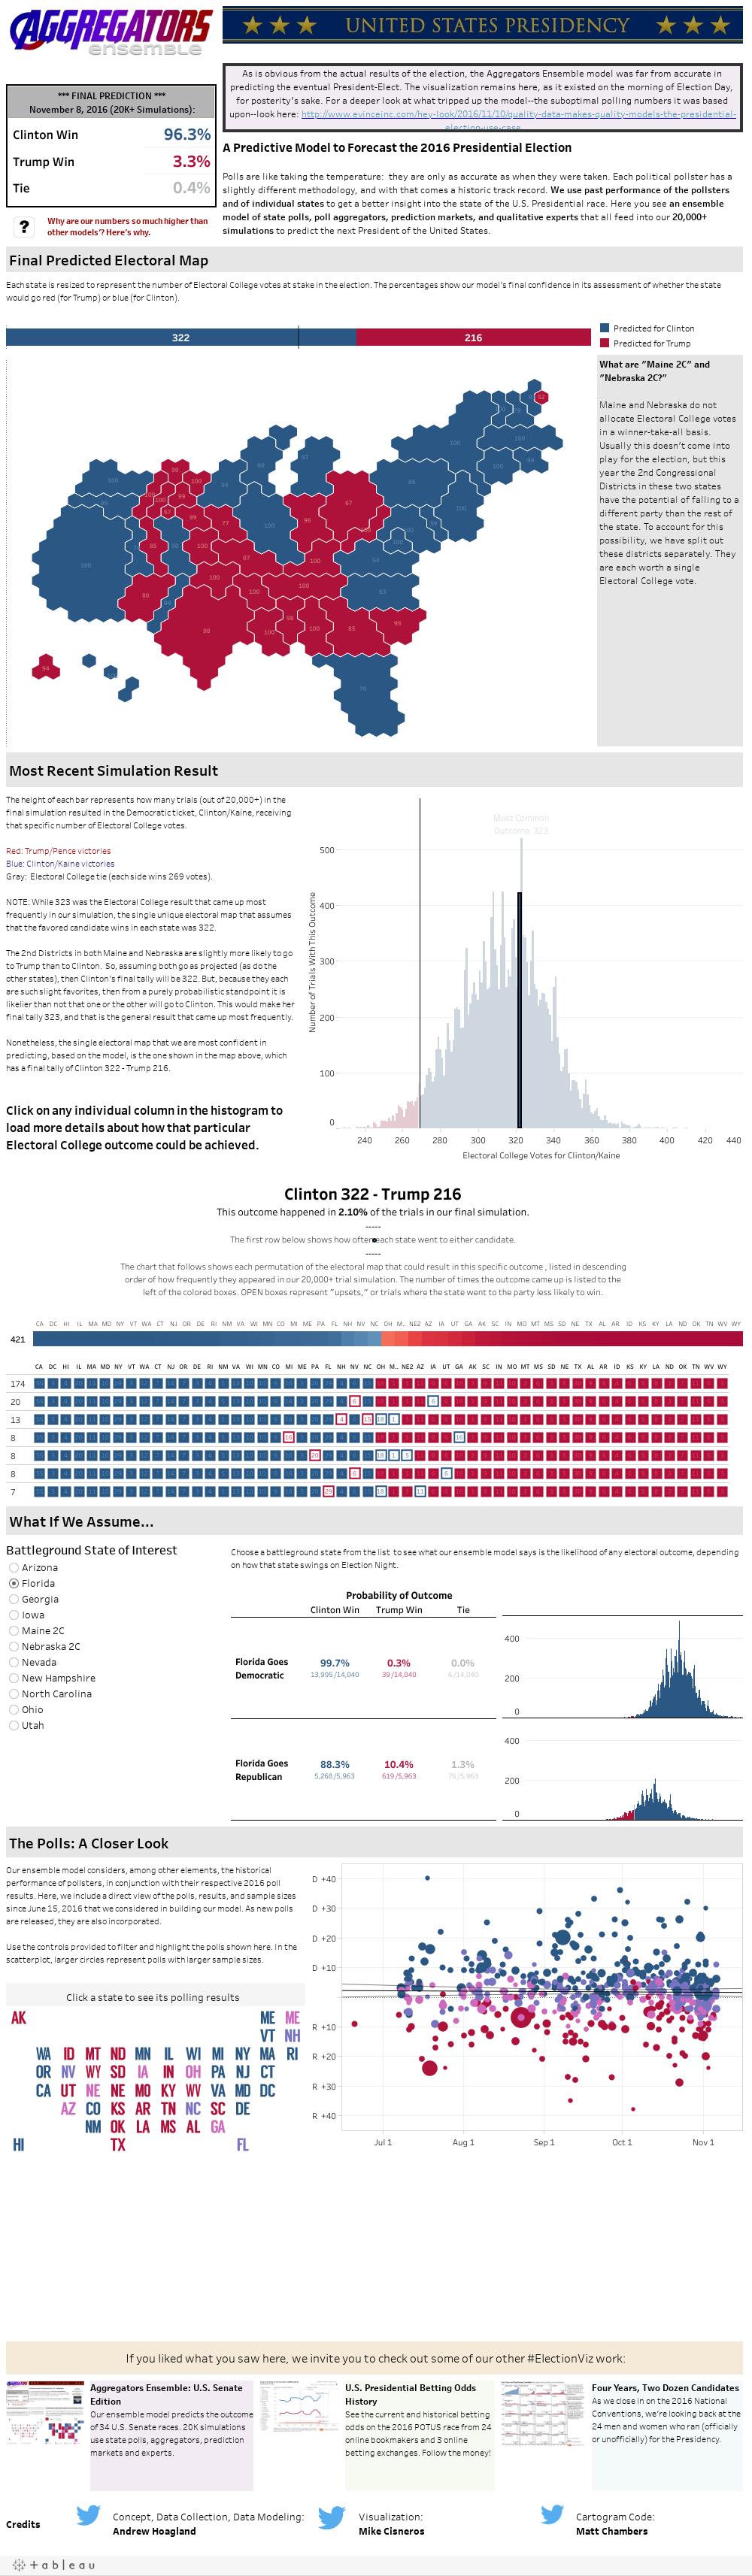 A White House 2016 Prediction Model